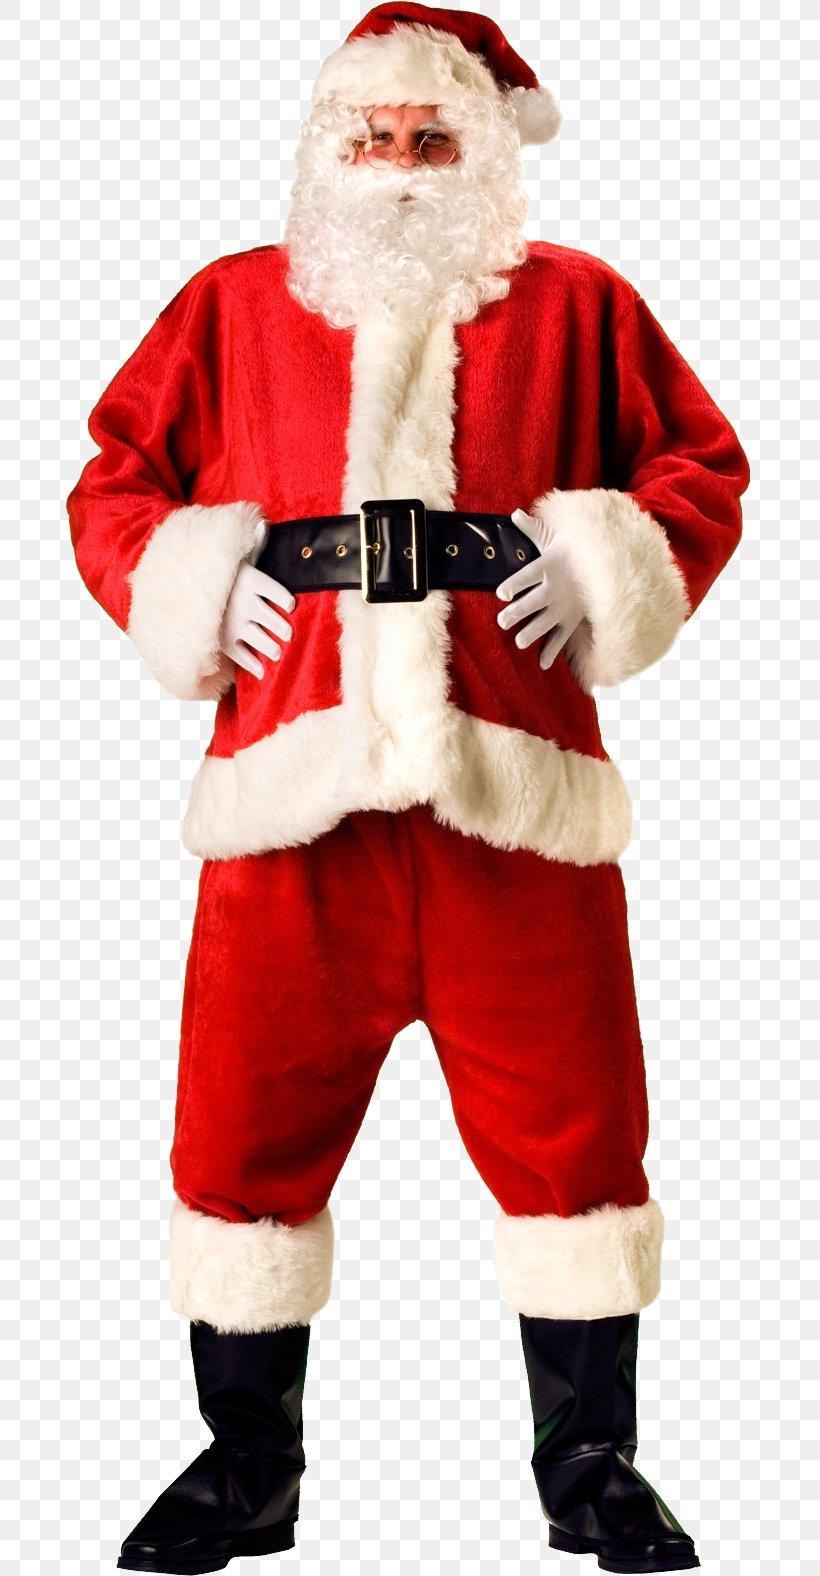 Salem Santa Claus Costume Halloween Christmas, PNG, 691x1576px, Santa Claus, Banquet, Christmas, Christmas Gift, Costume Download Free